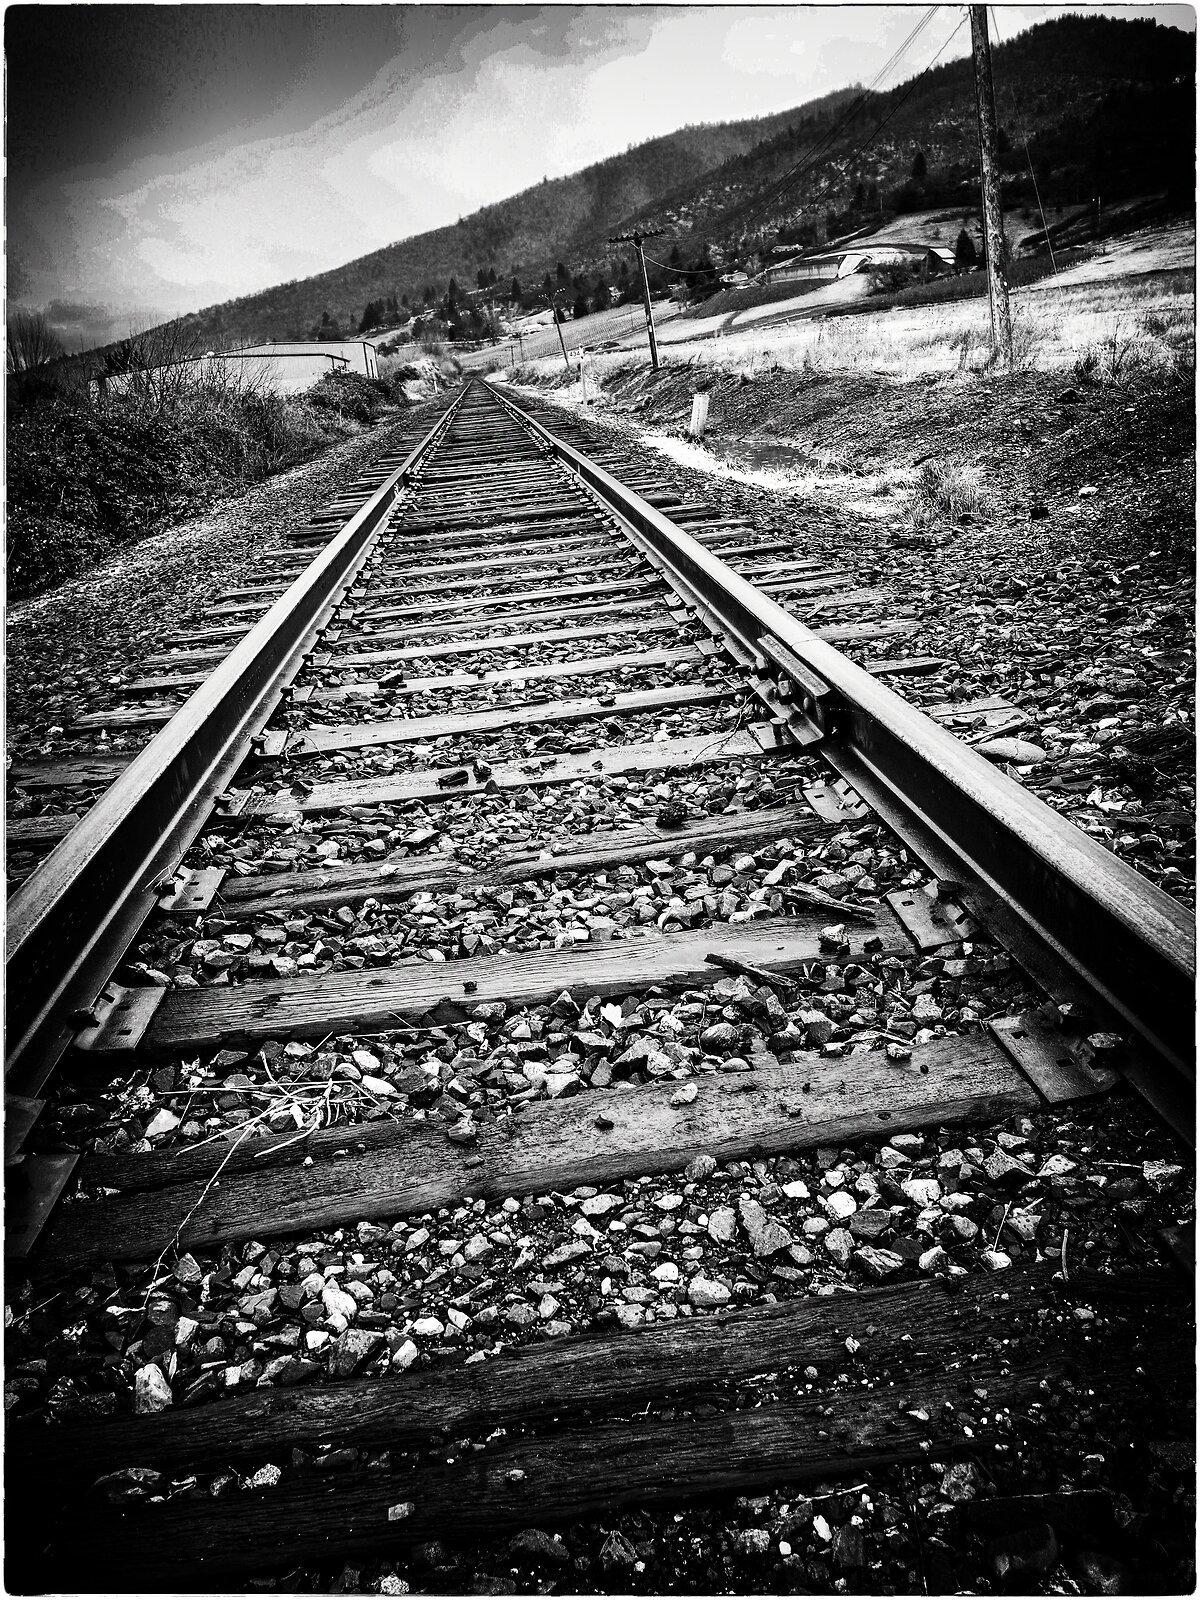 PenF_Jan6_21_train_tracks.jpg